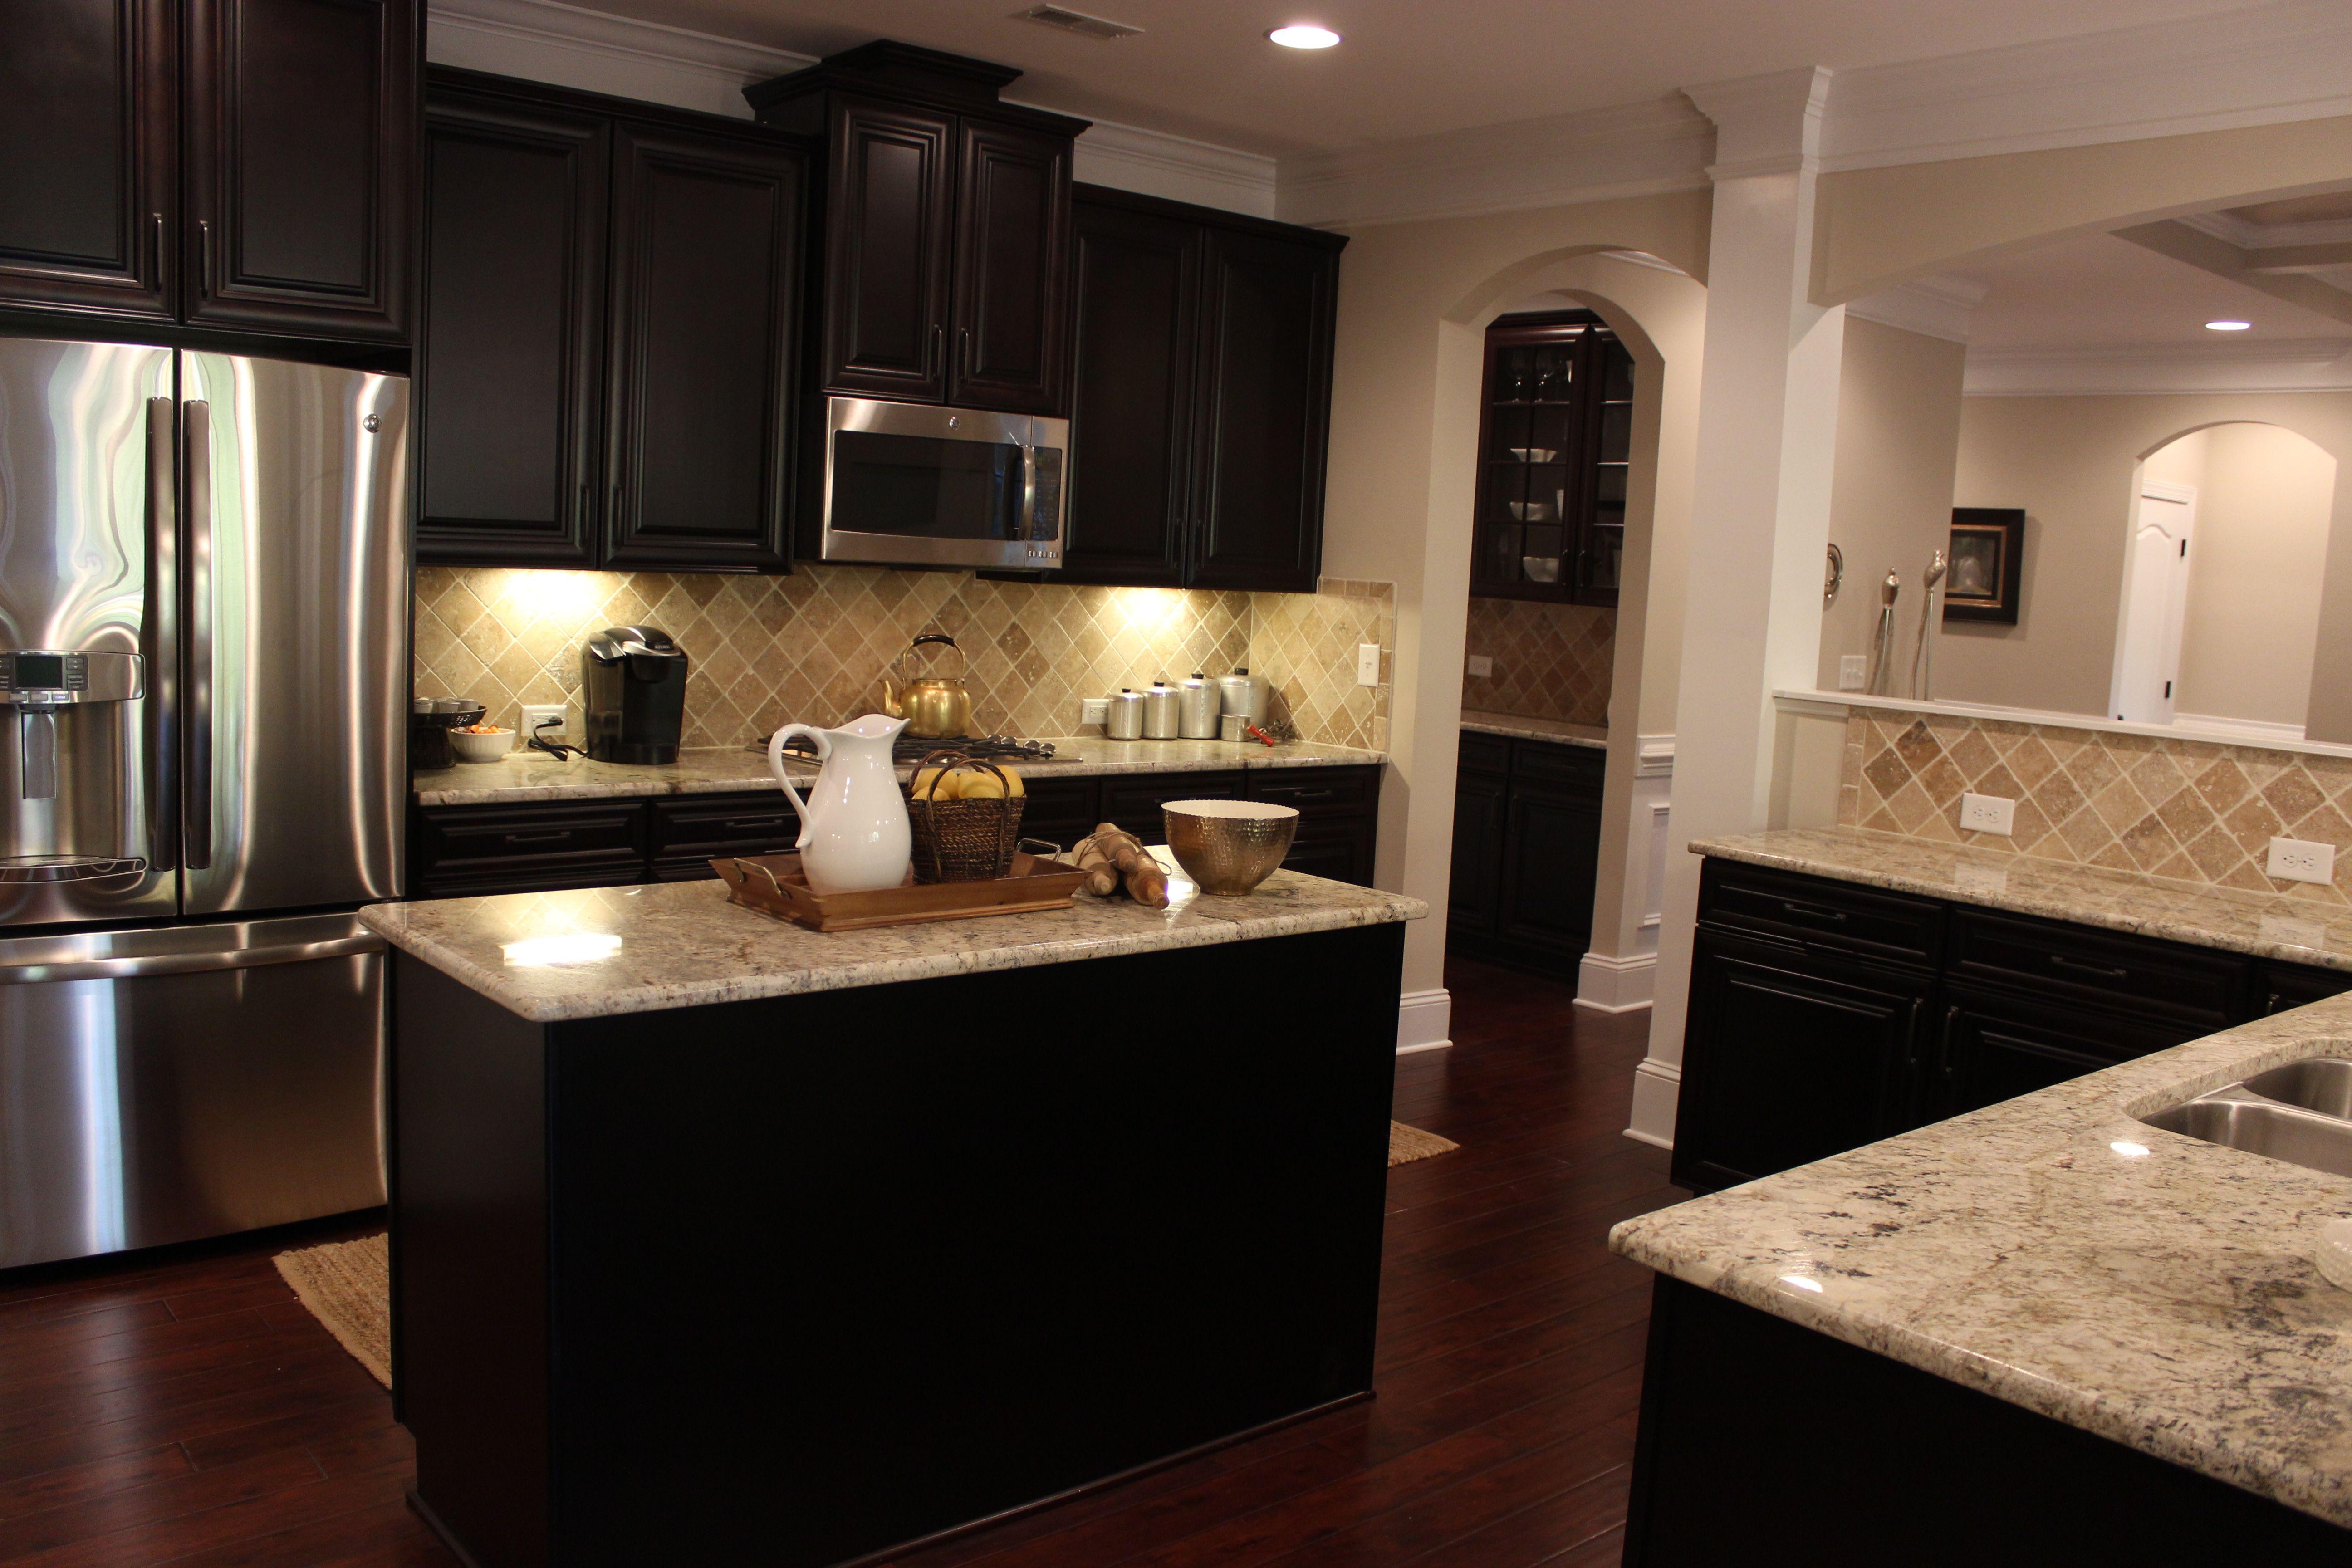 essex homes - katherine model - kitchen | design projects